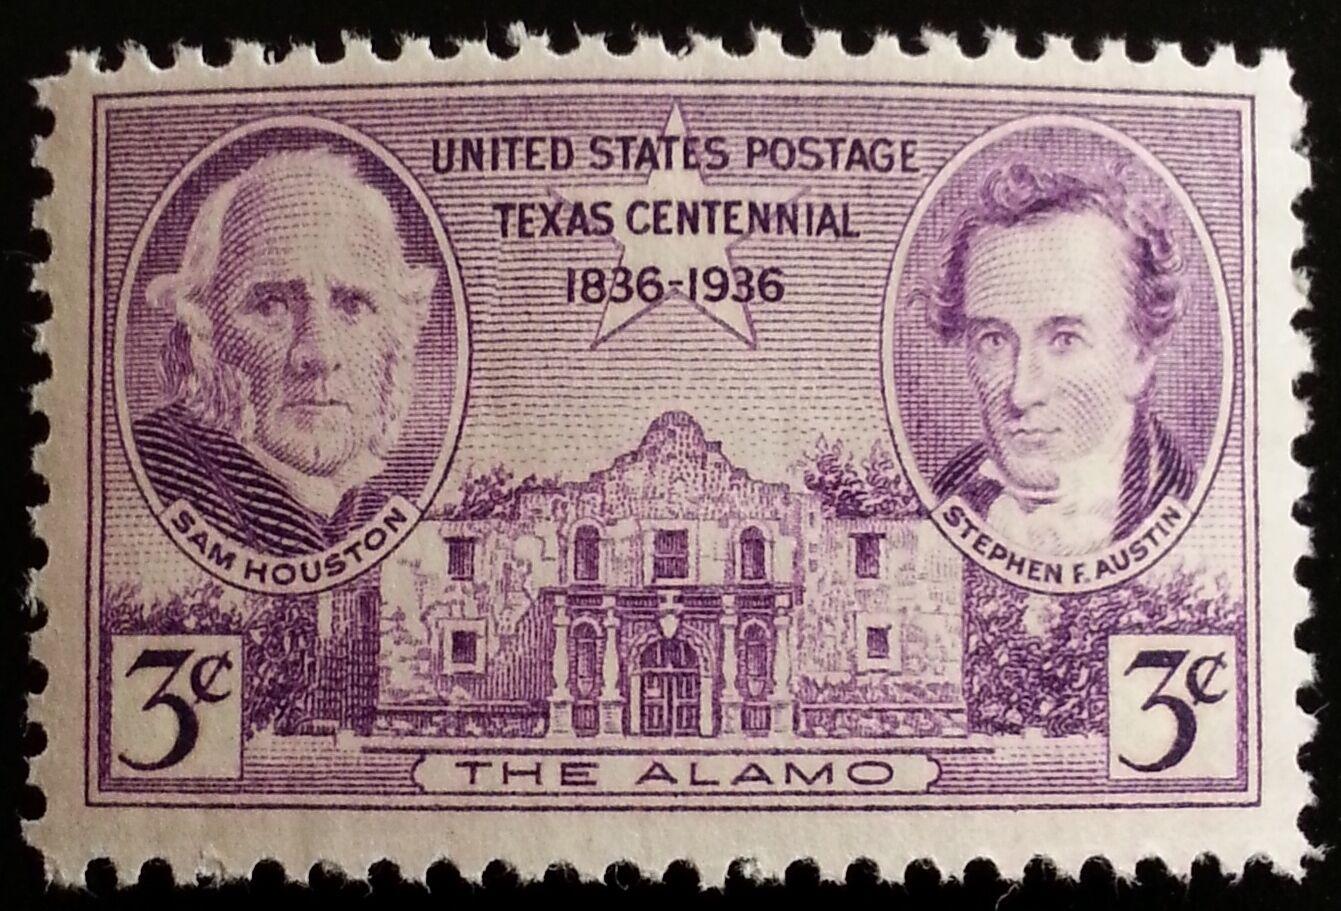 1936 3c Texas Independence Centennial, The Alamo Scott